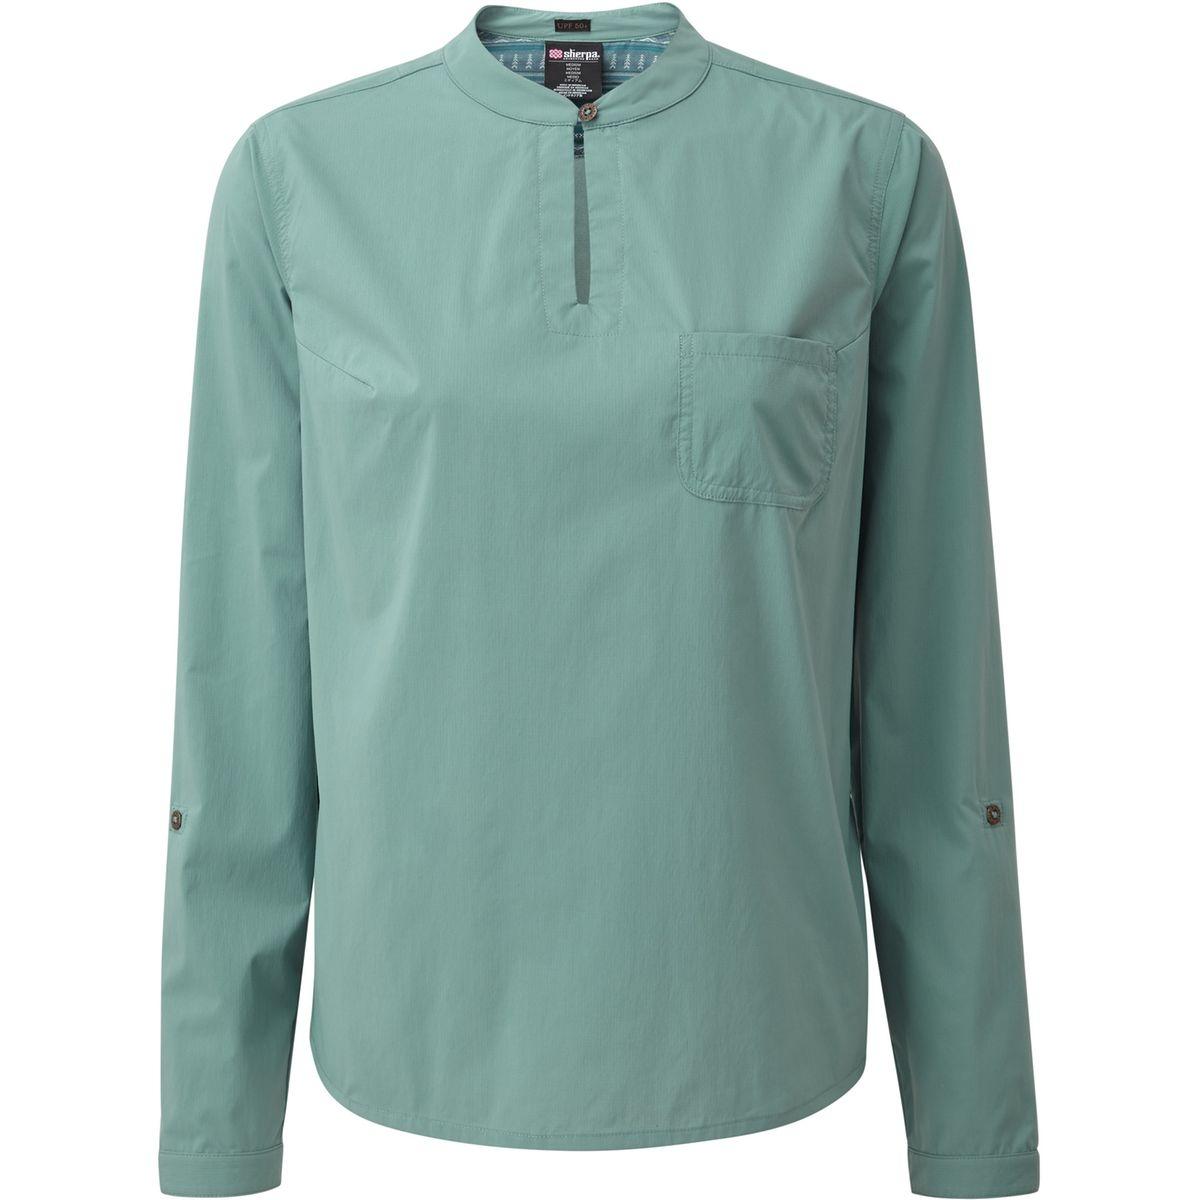 Ravi - T-shirt manches longues Femme - vert